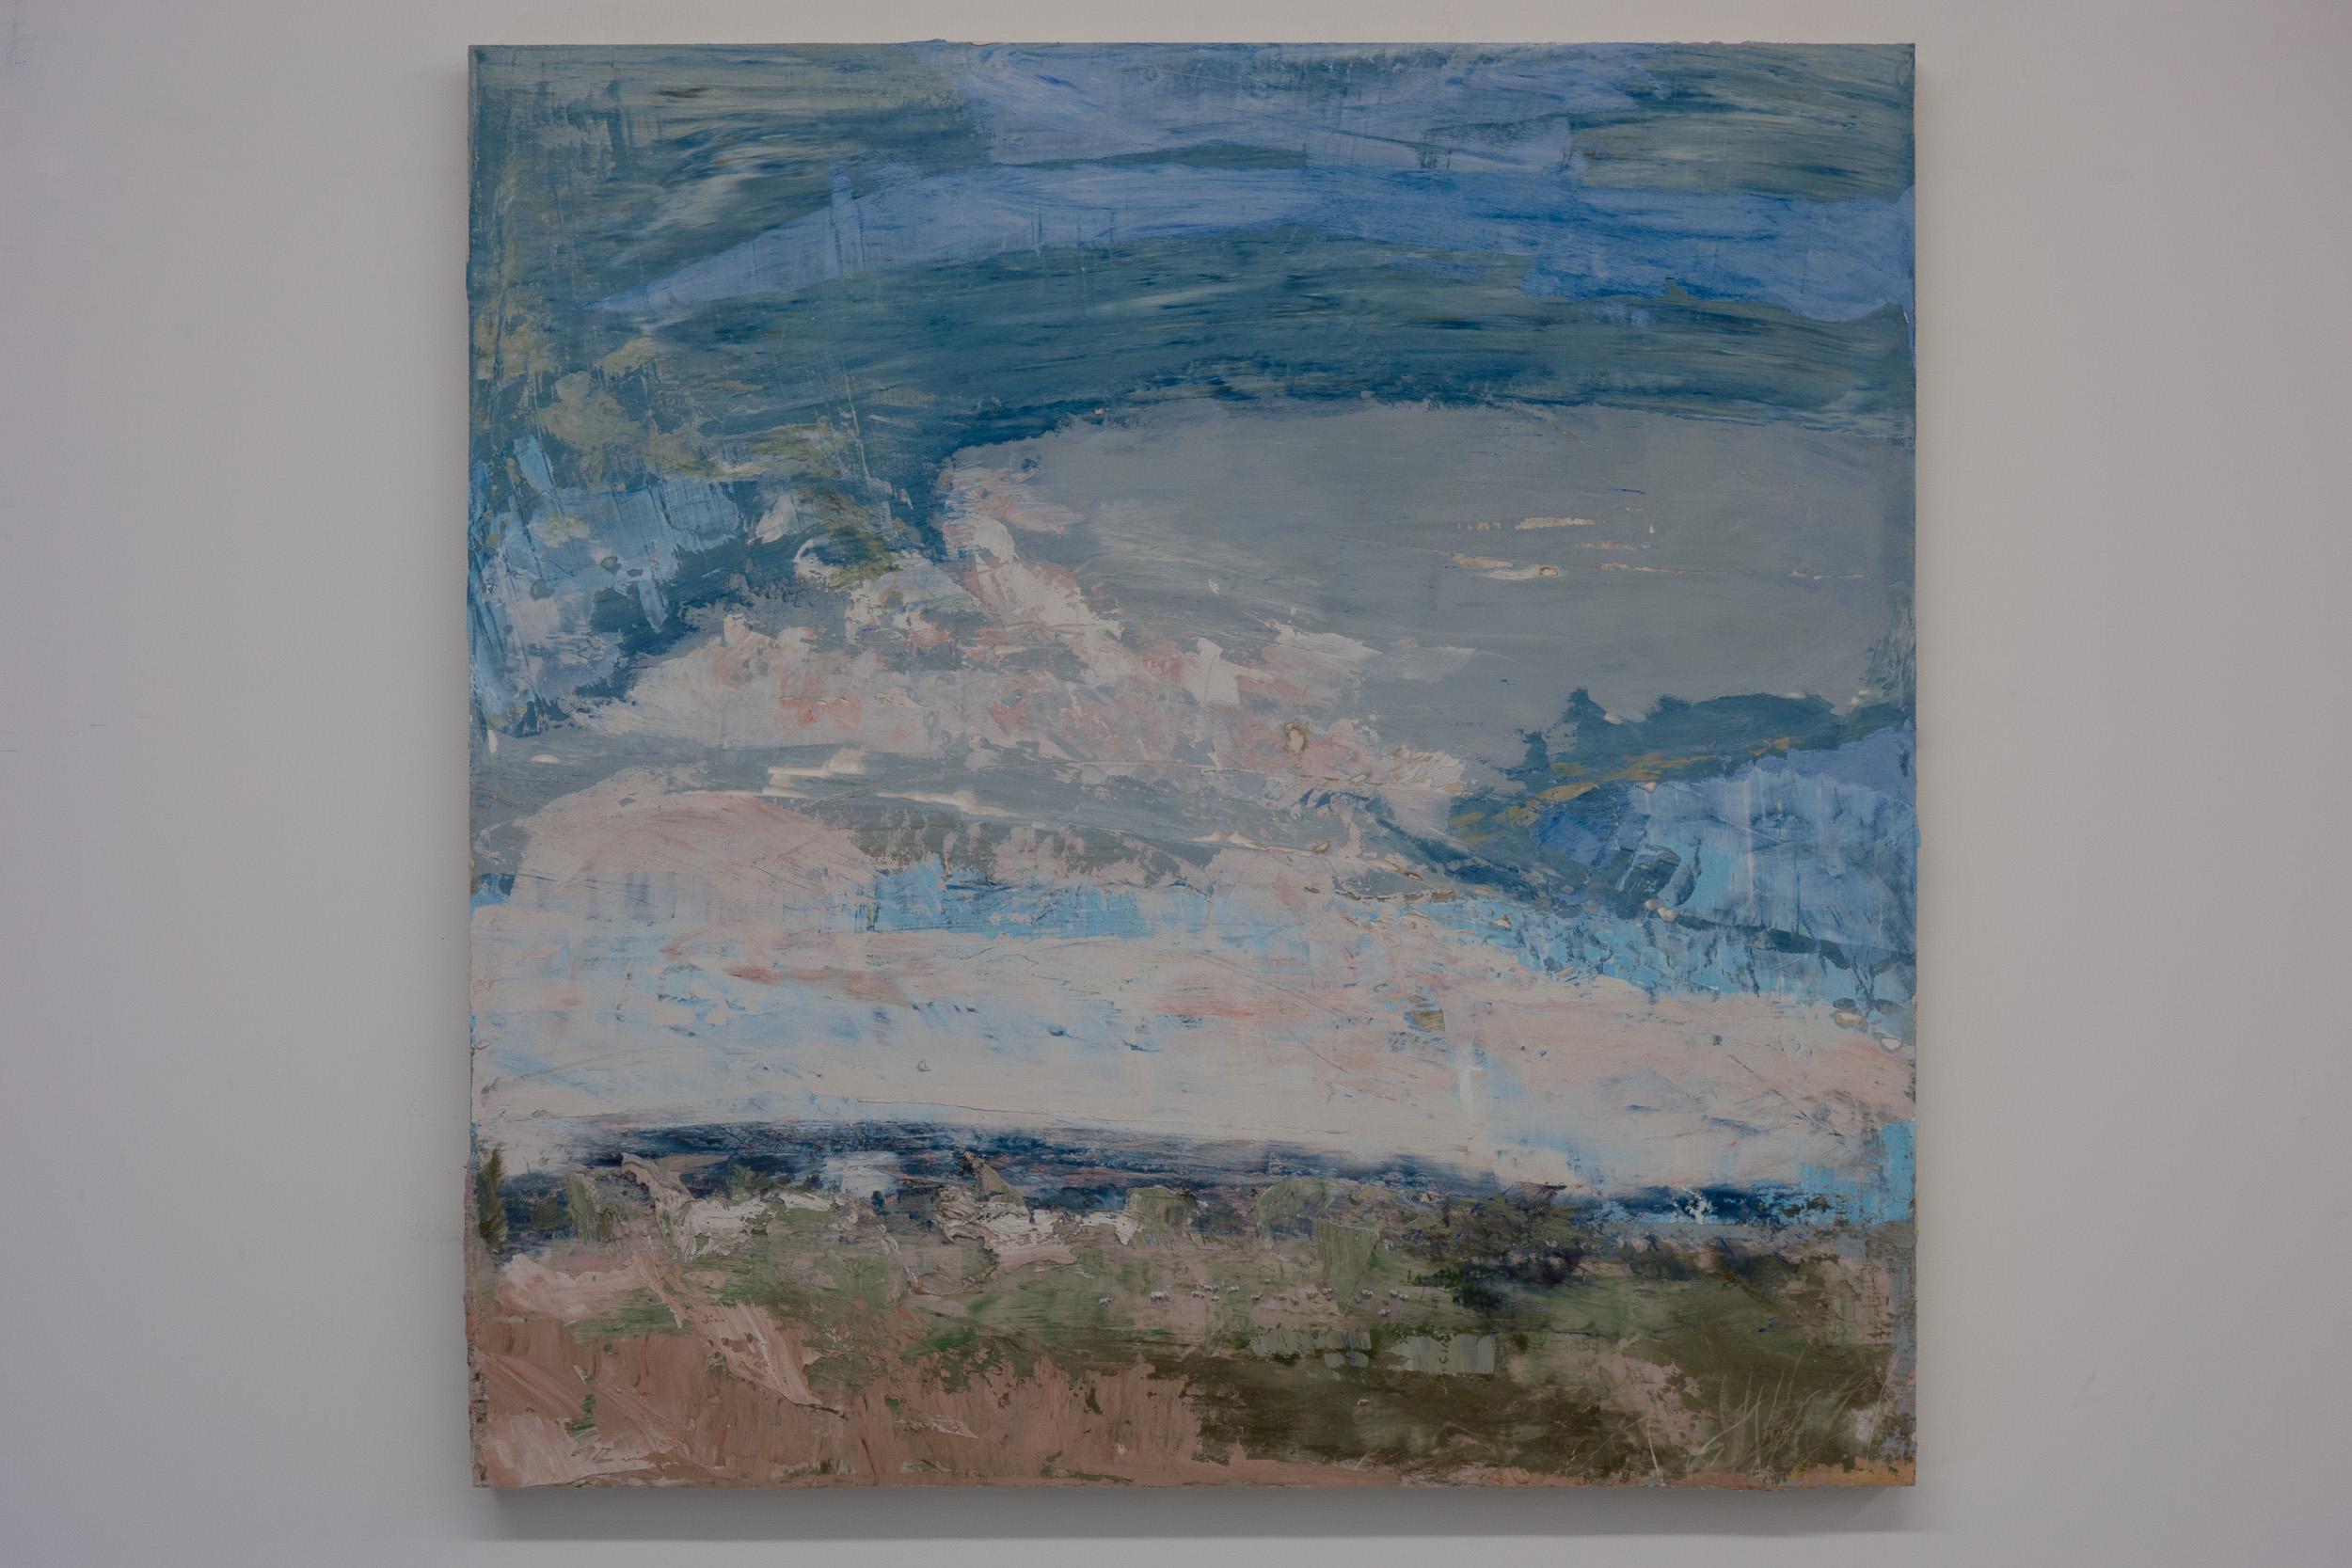 Shelley Vanderbyl - A View From Slightly Higher - 2016 - Fresco on Panel - 36x36.jpg